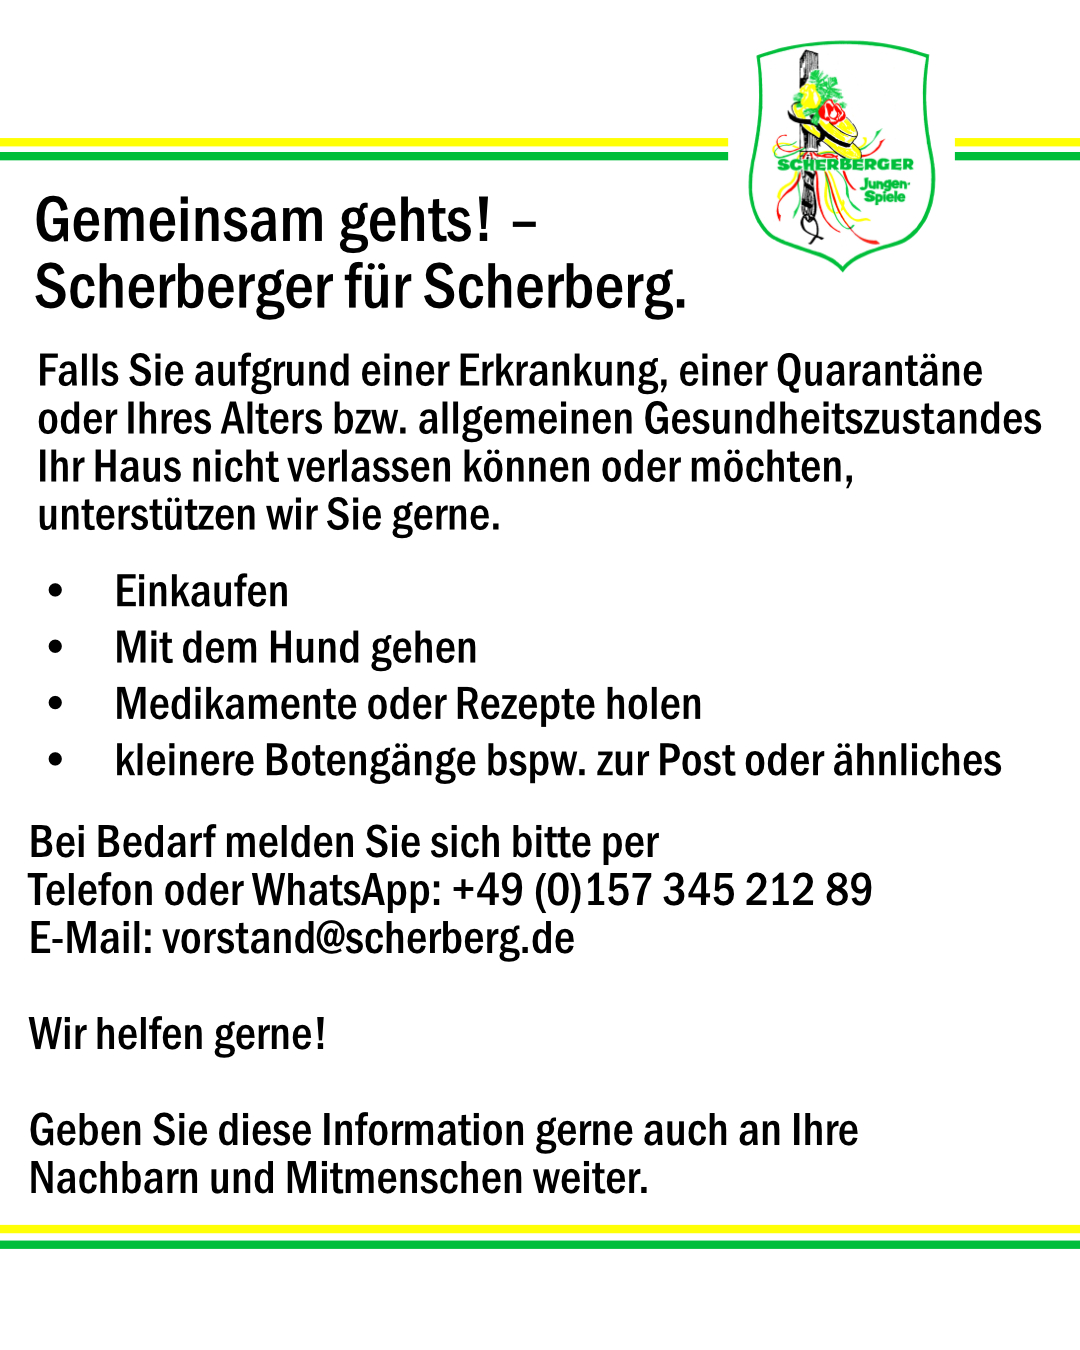 Scherberg